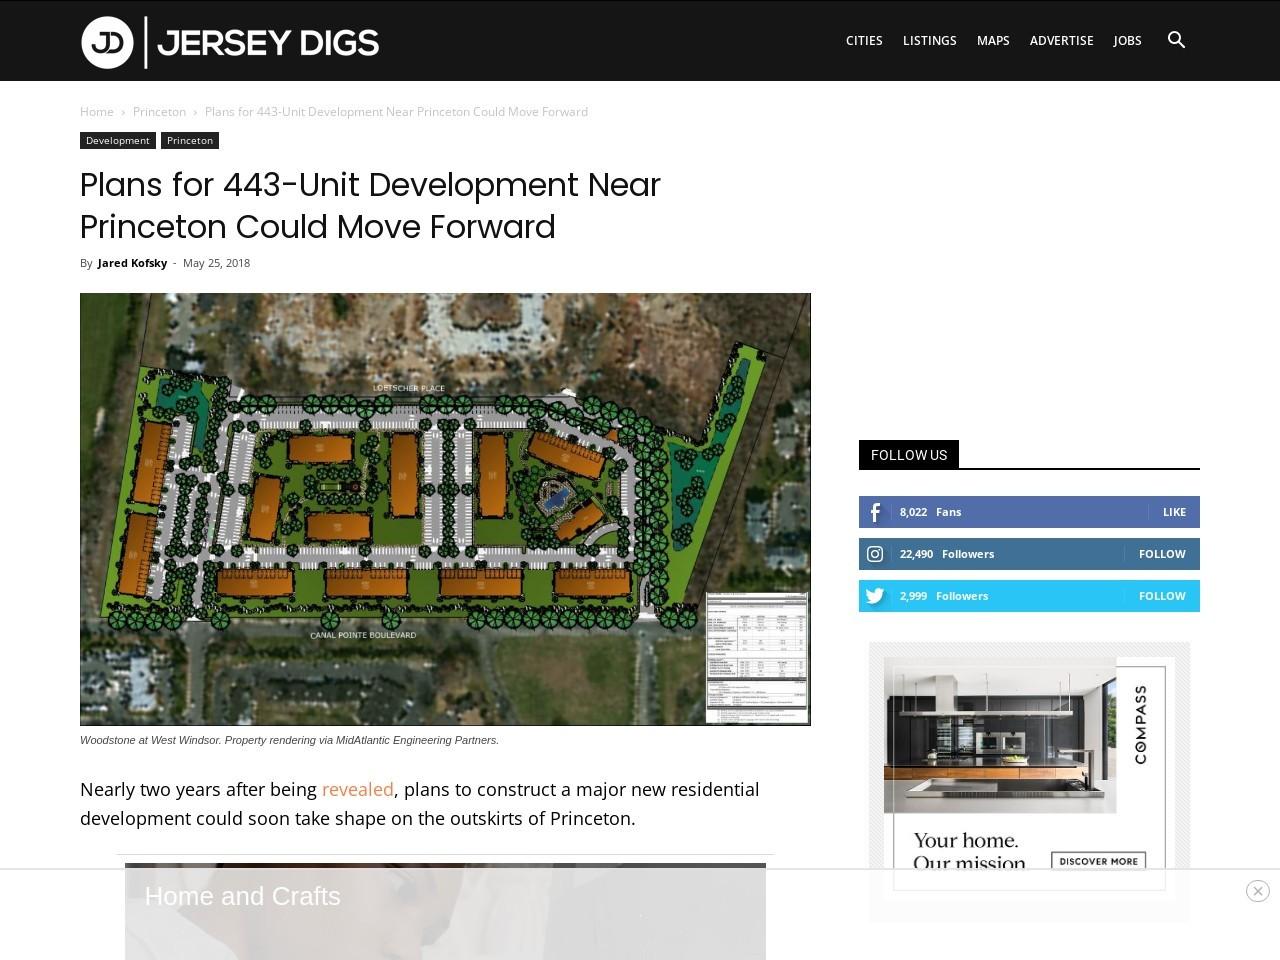 Plans for 443-Unit Development Near Princeton Could Move Forward